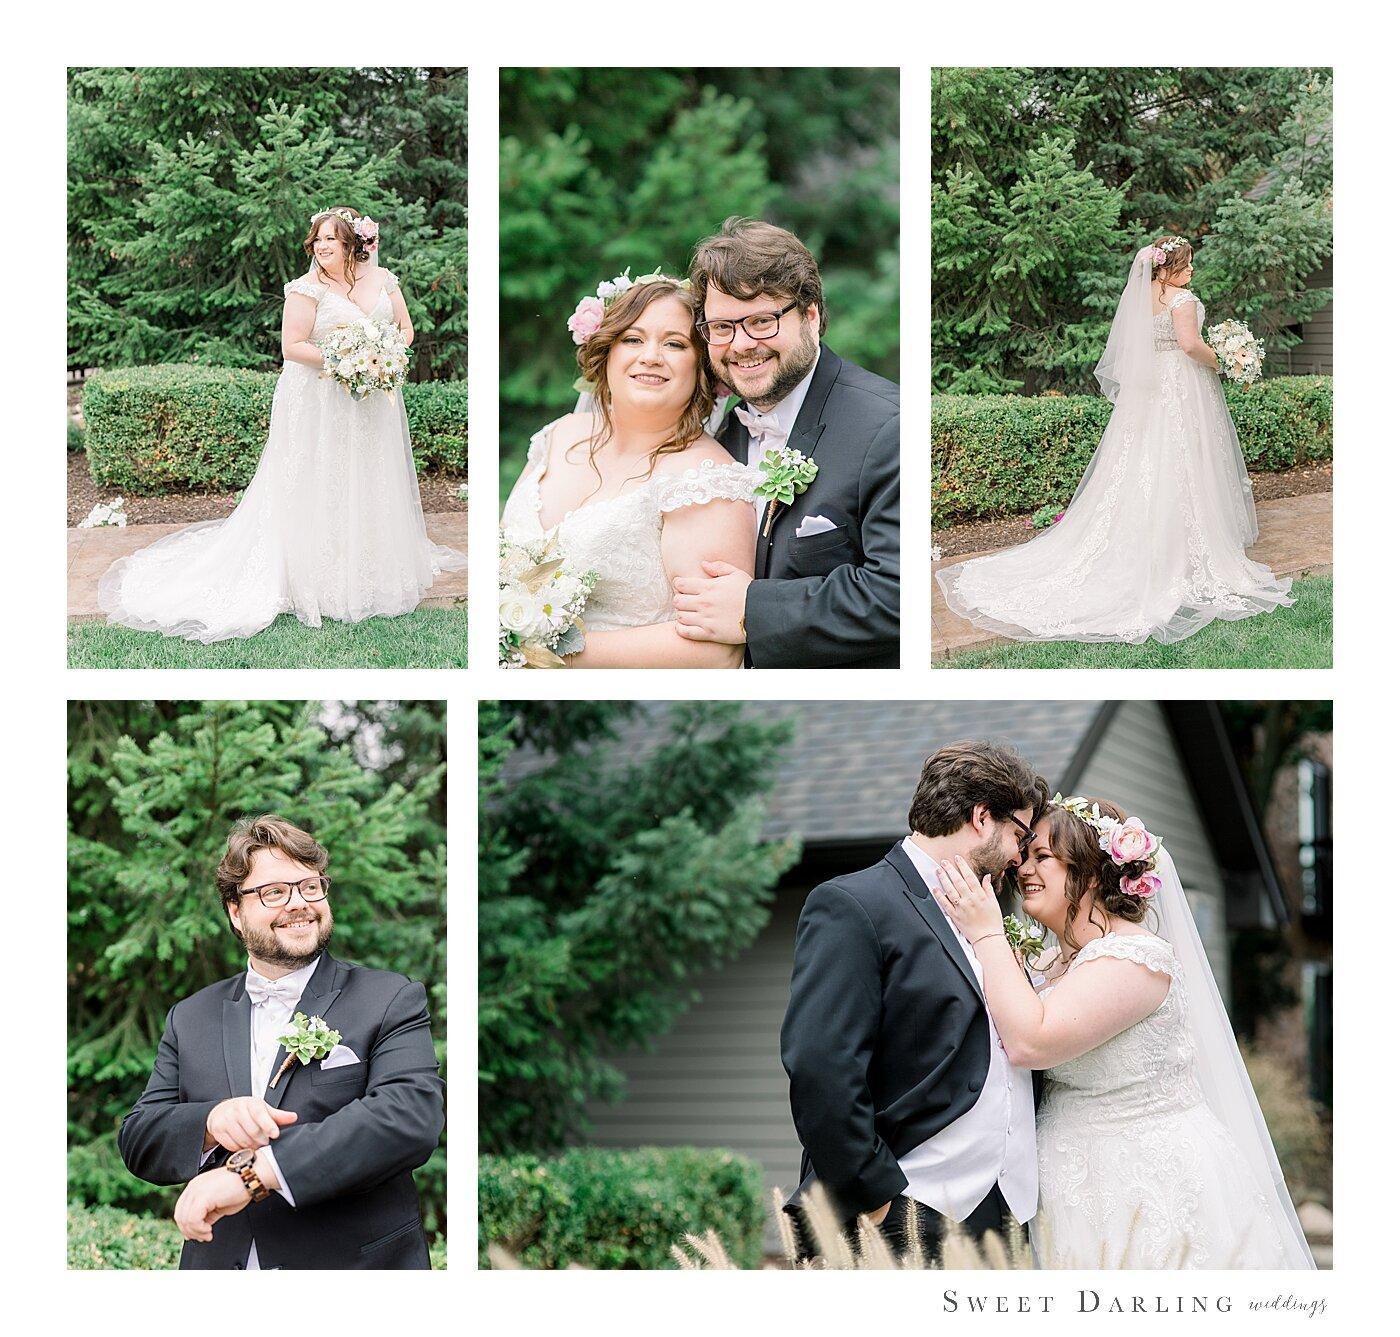 Bloomington-Normal-IL-Wedding-Photographer-eastland-suites-hotel_0016.jpg